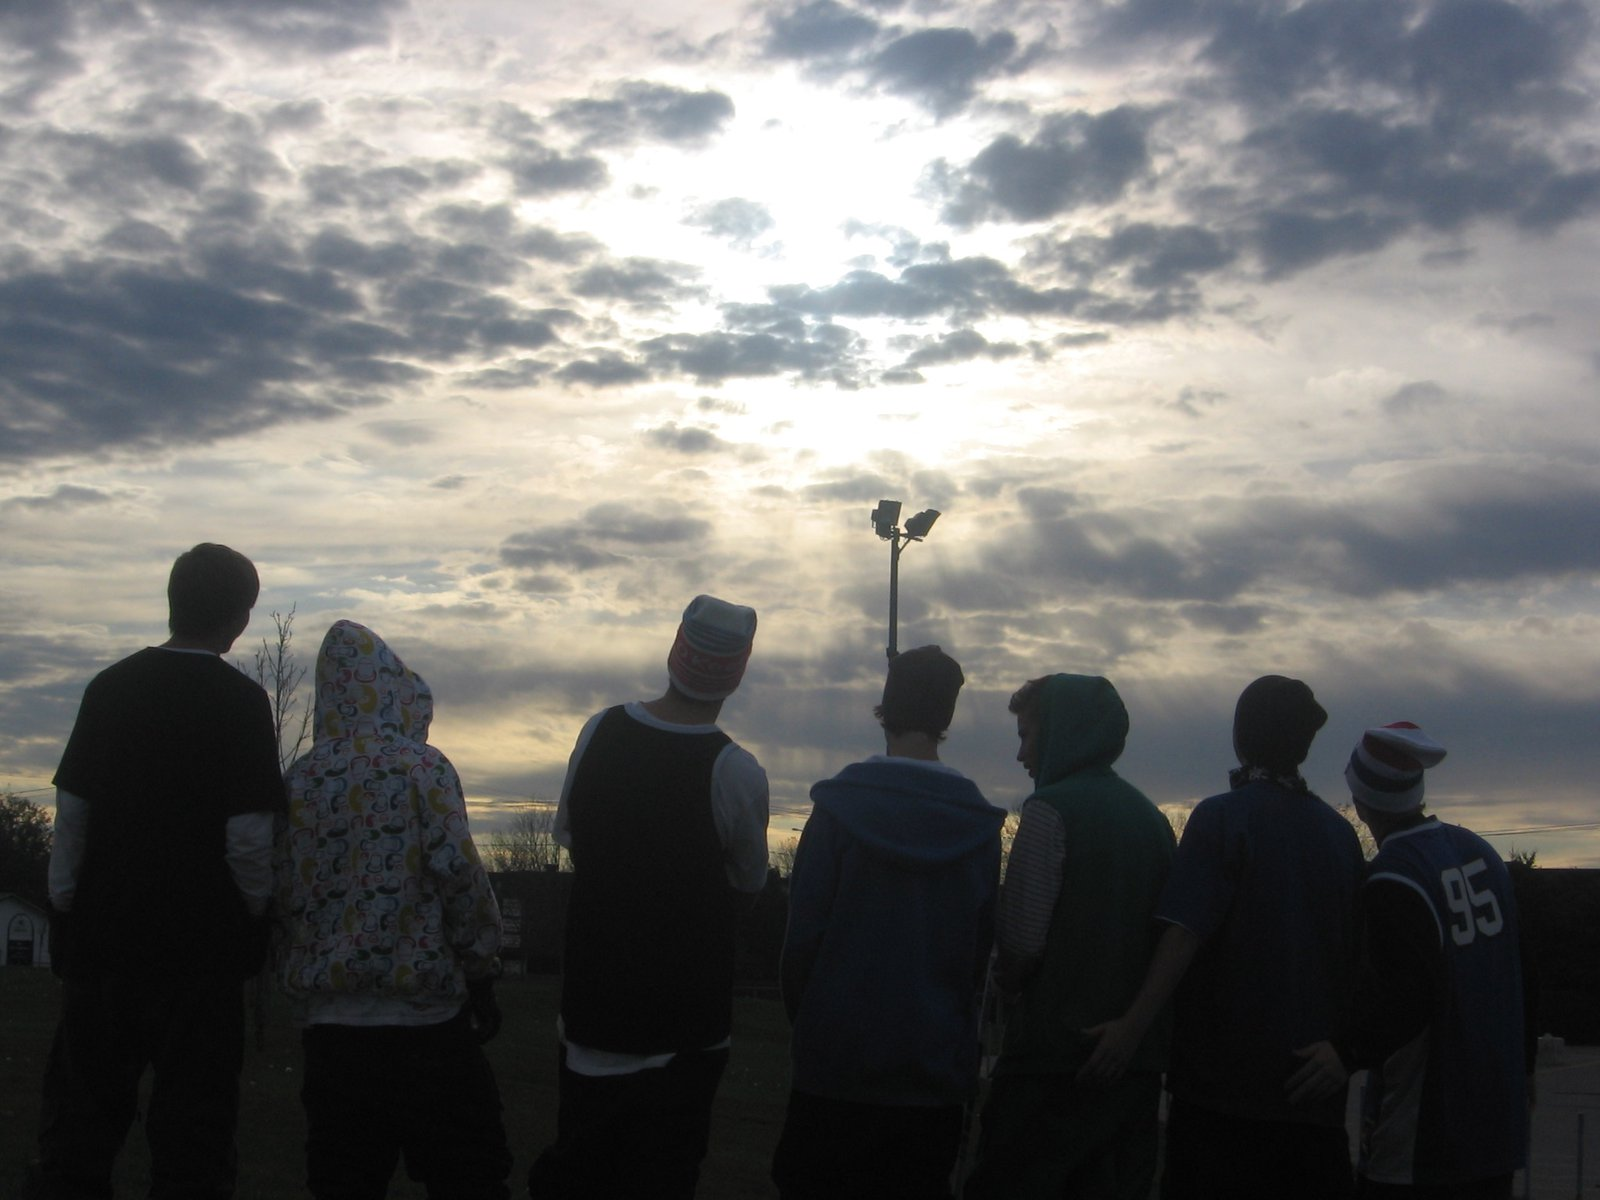 Sunset = end of jib sesh